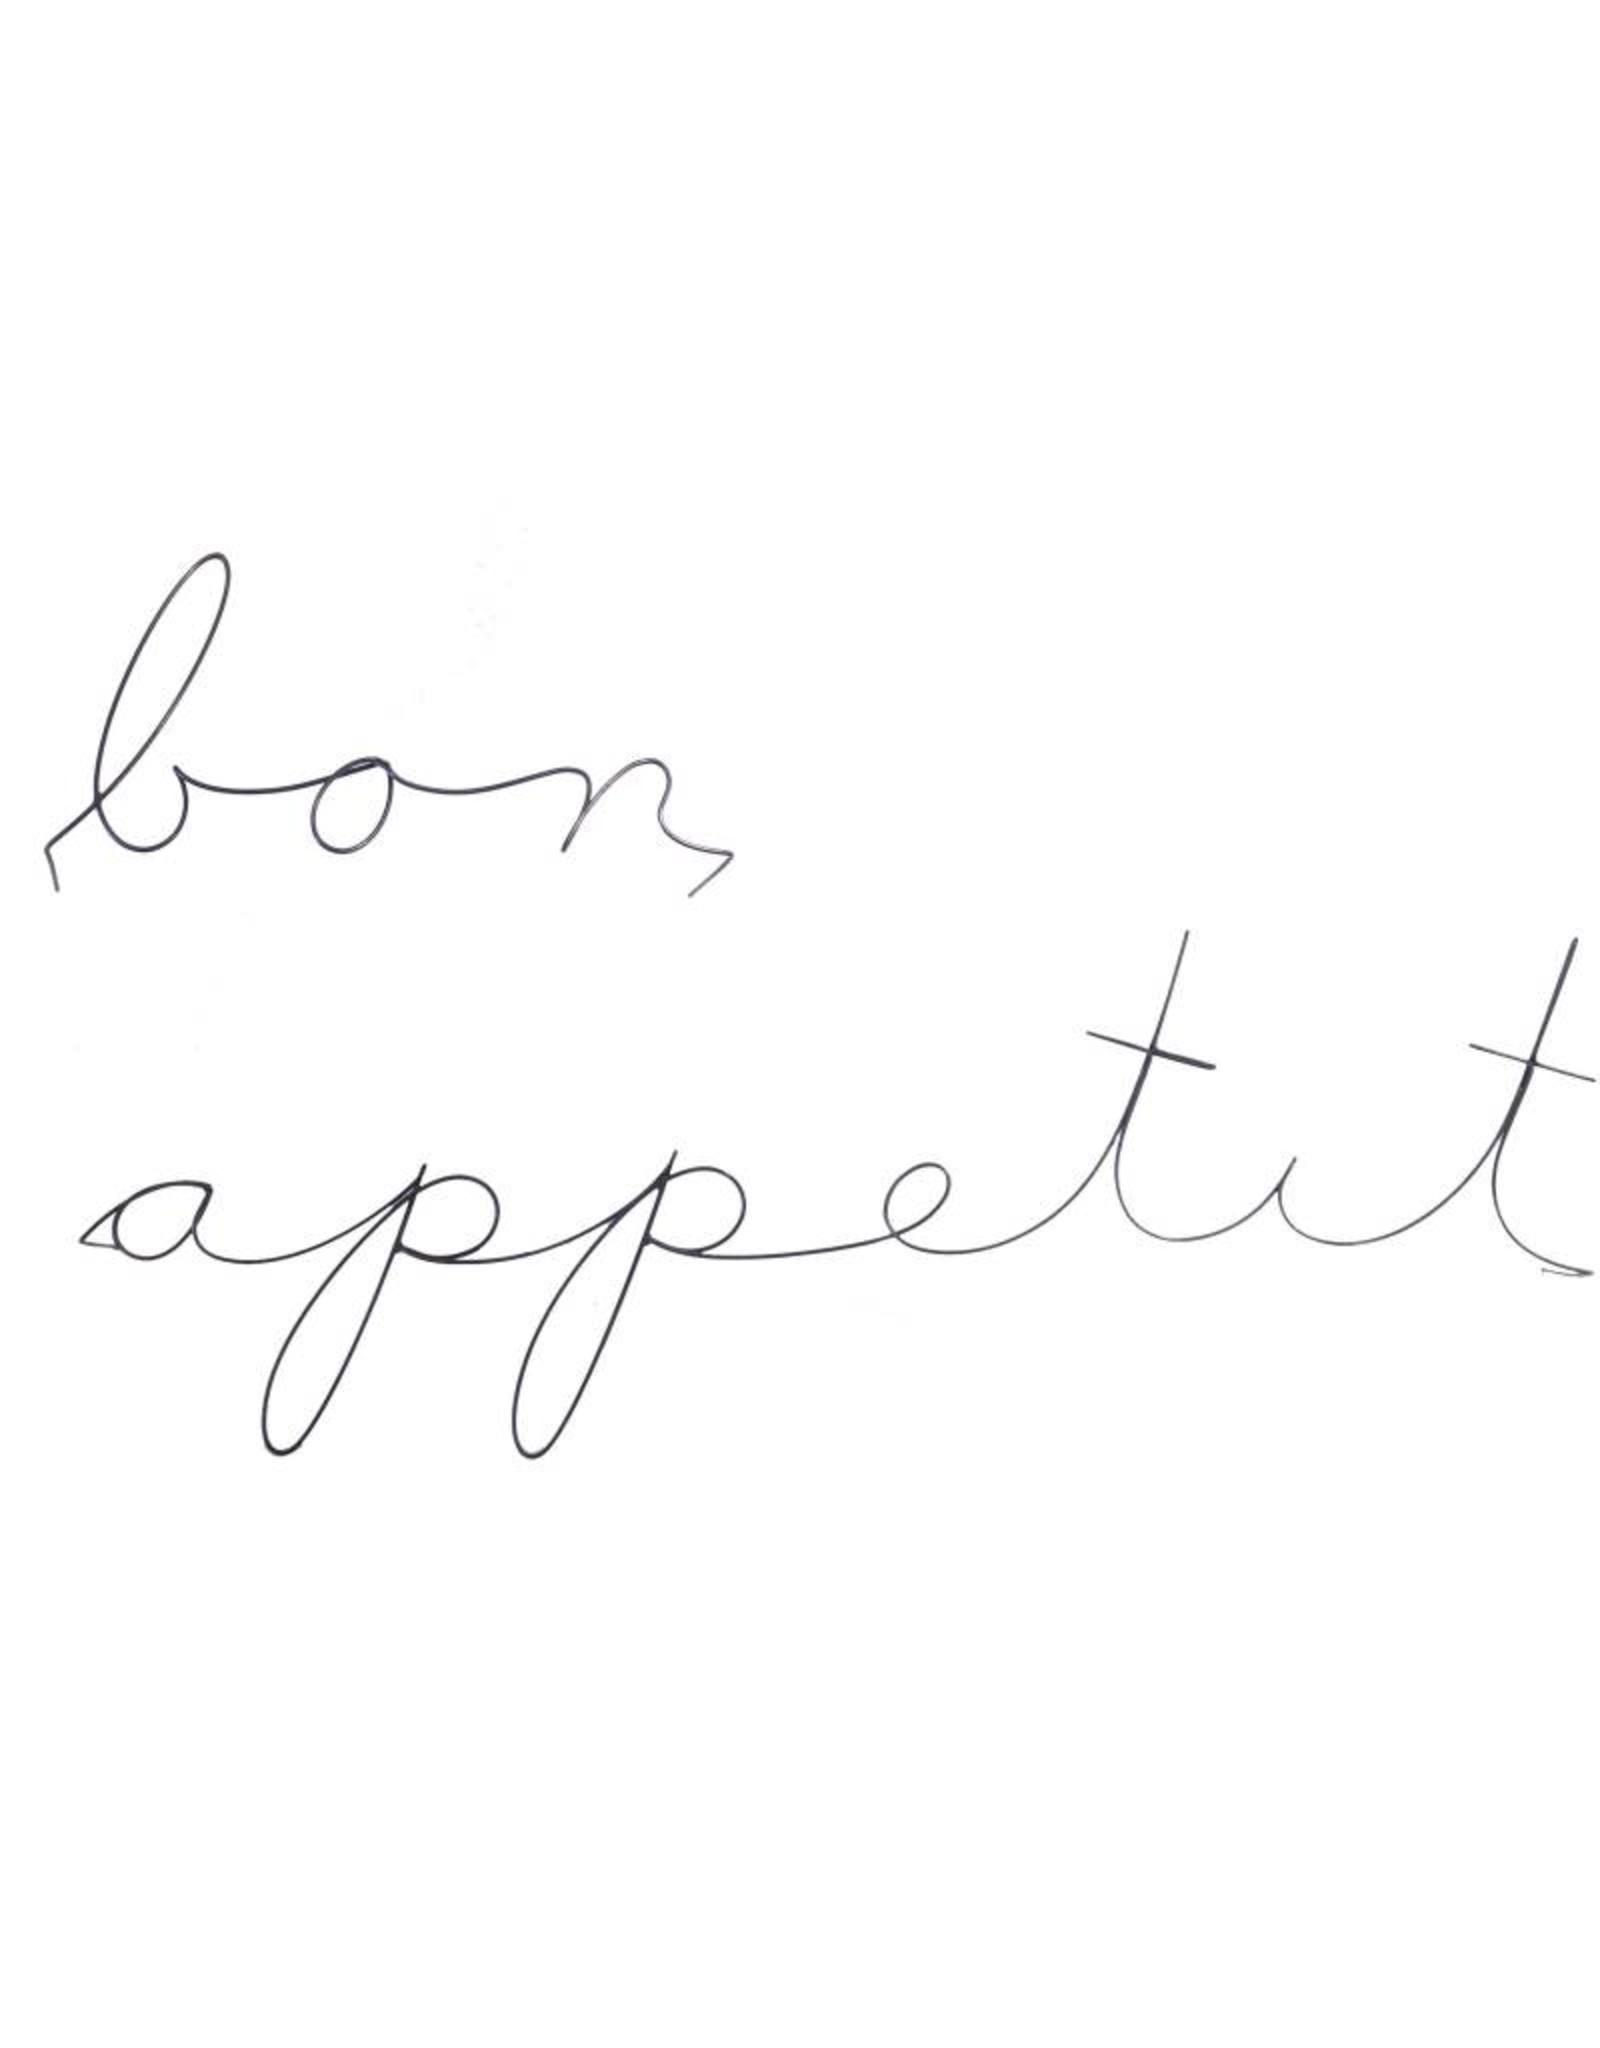 Gauge NYC 'bon appetit' Wire Word Poetic